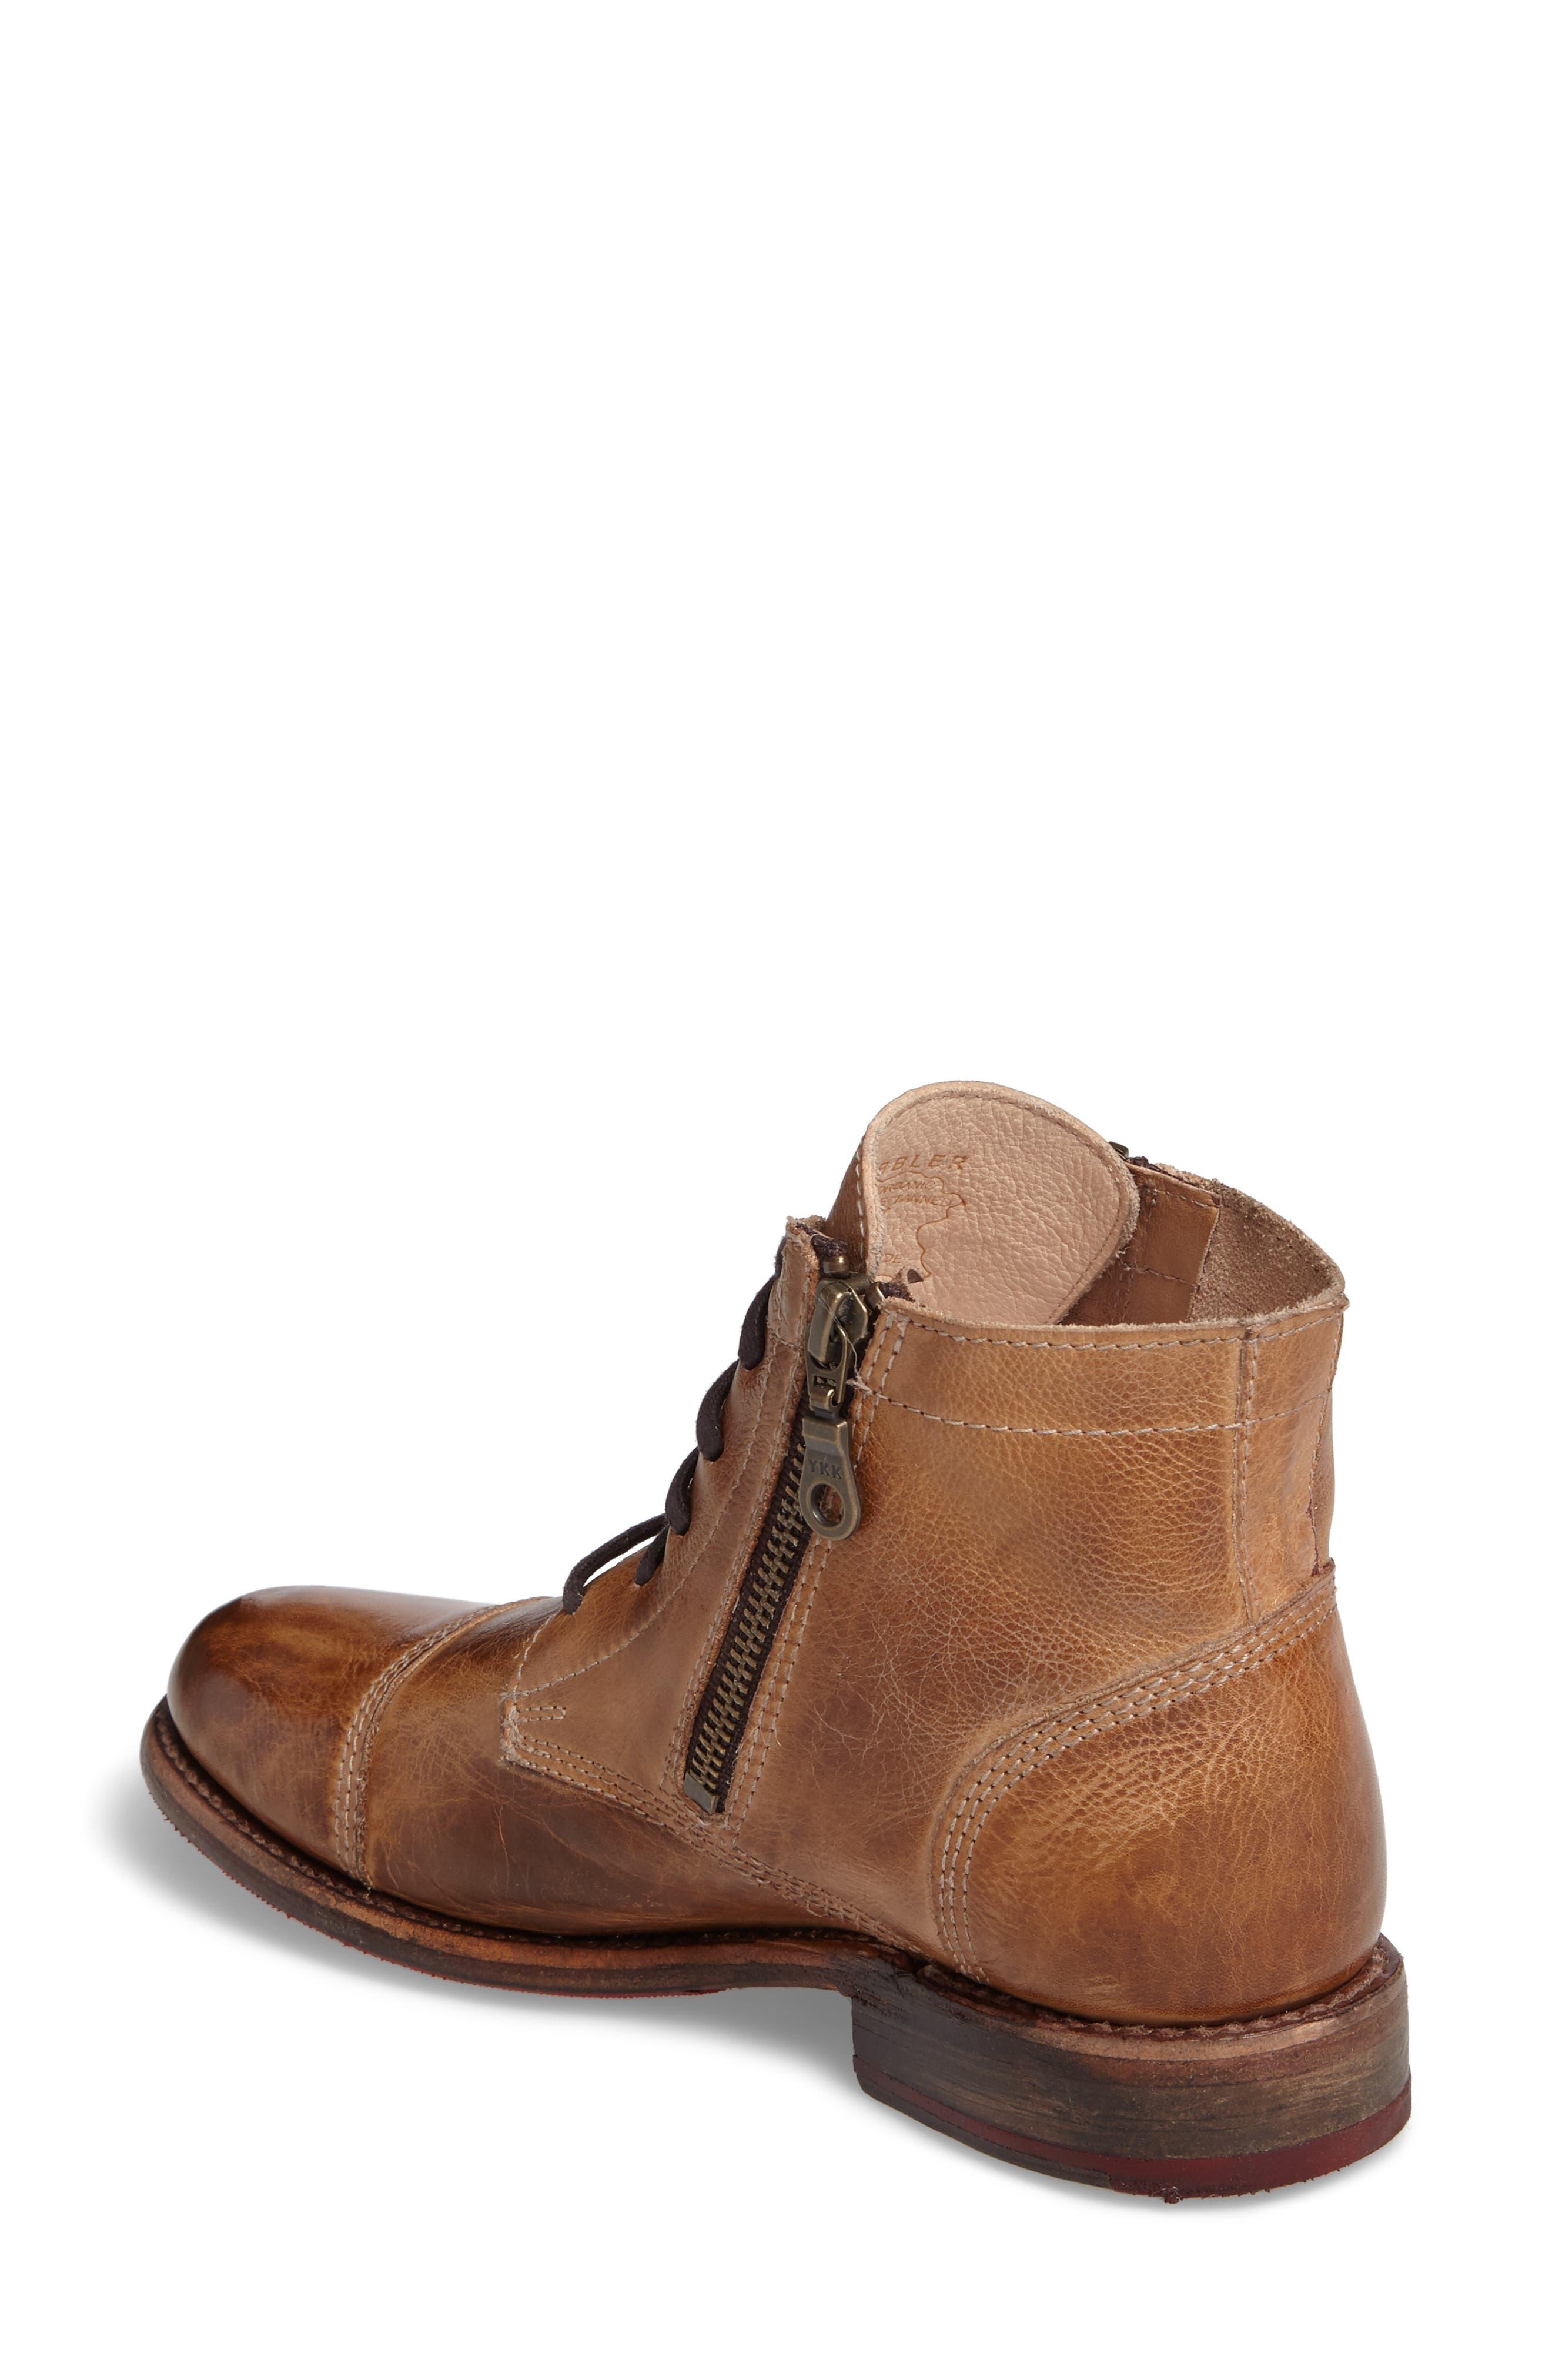 Alternate Image 2  - Bed Stu 'Bonnie' Boot